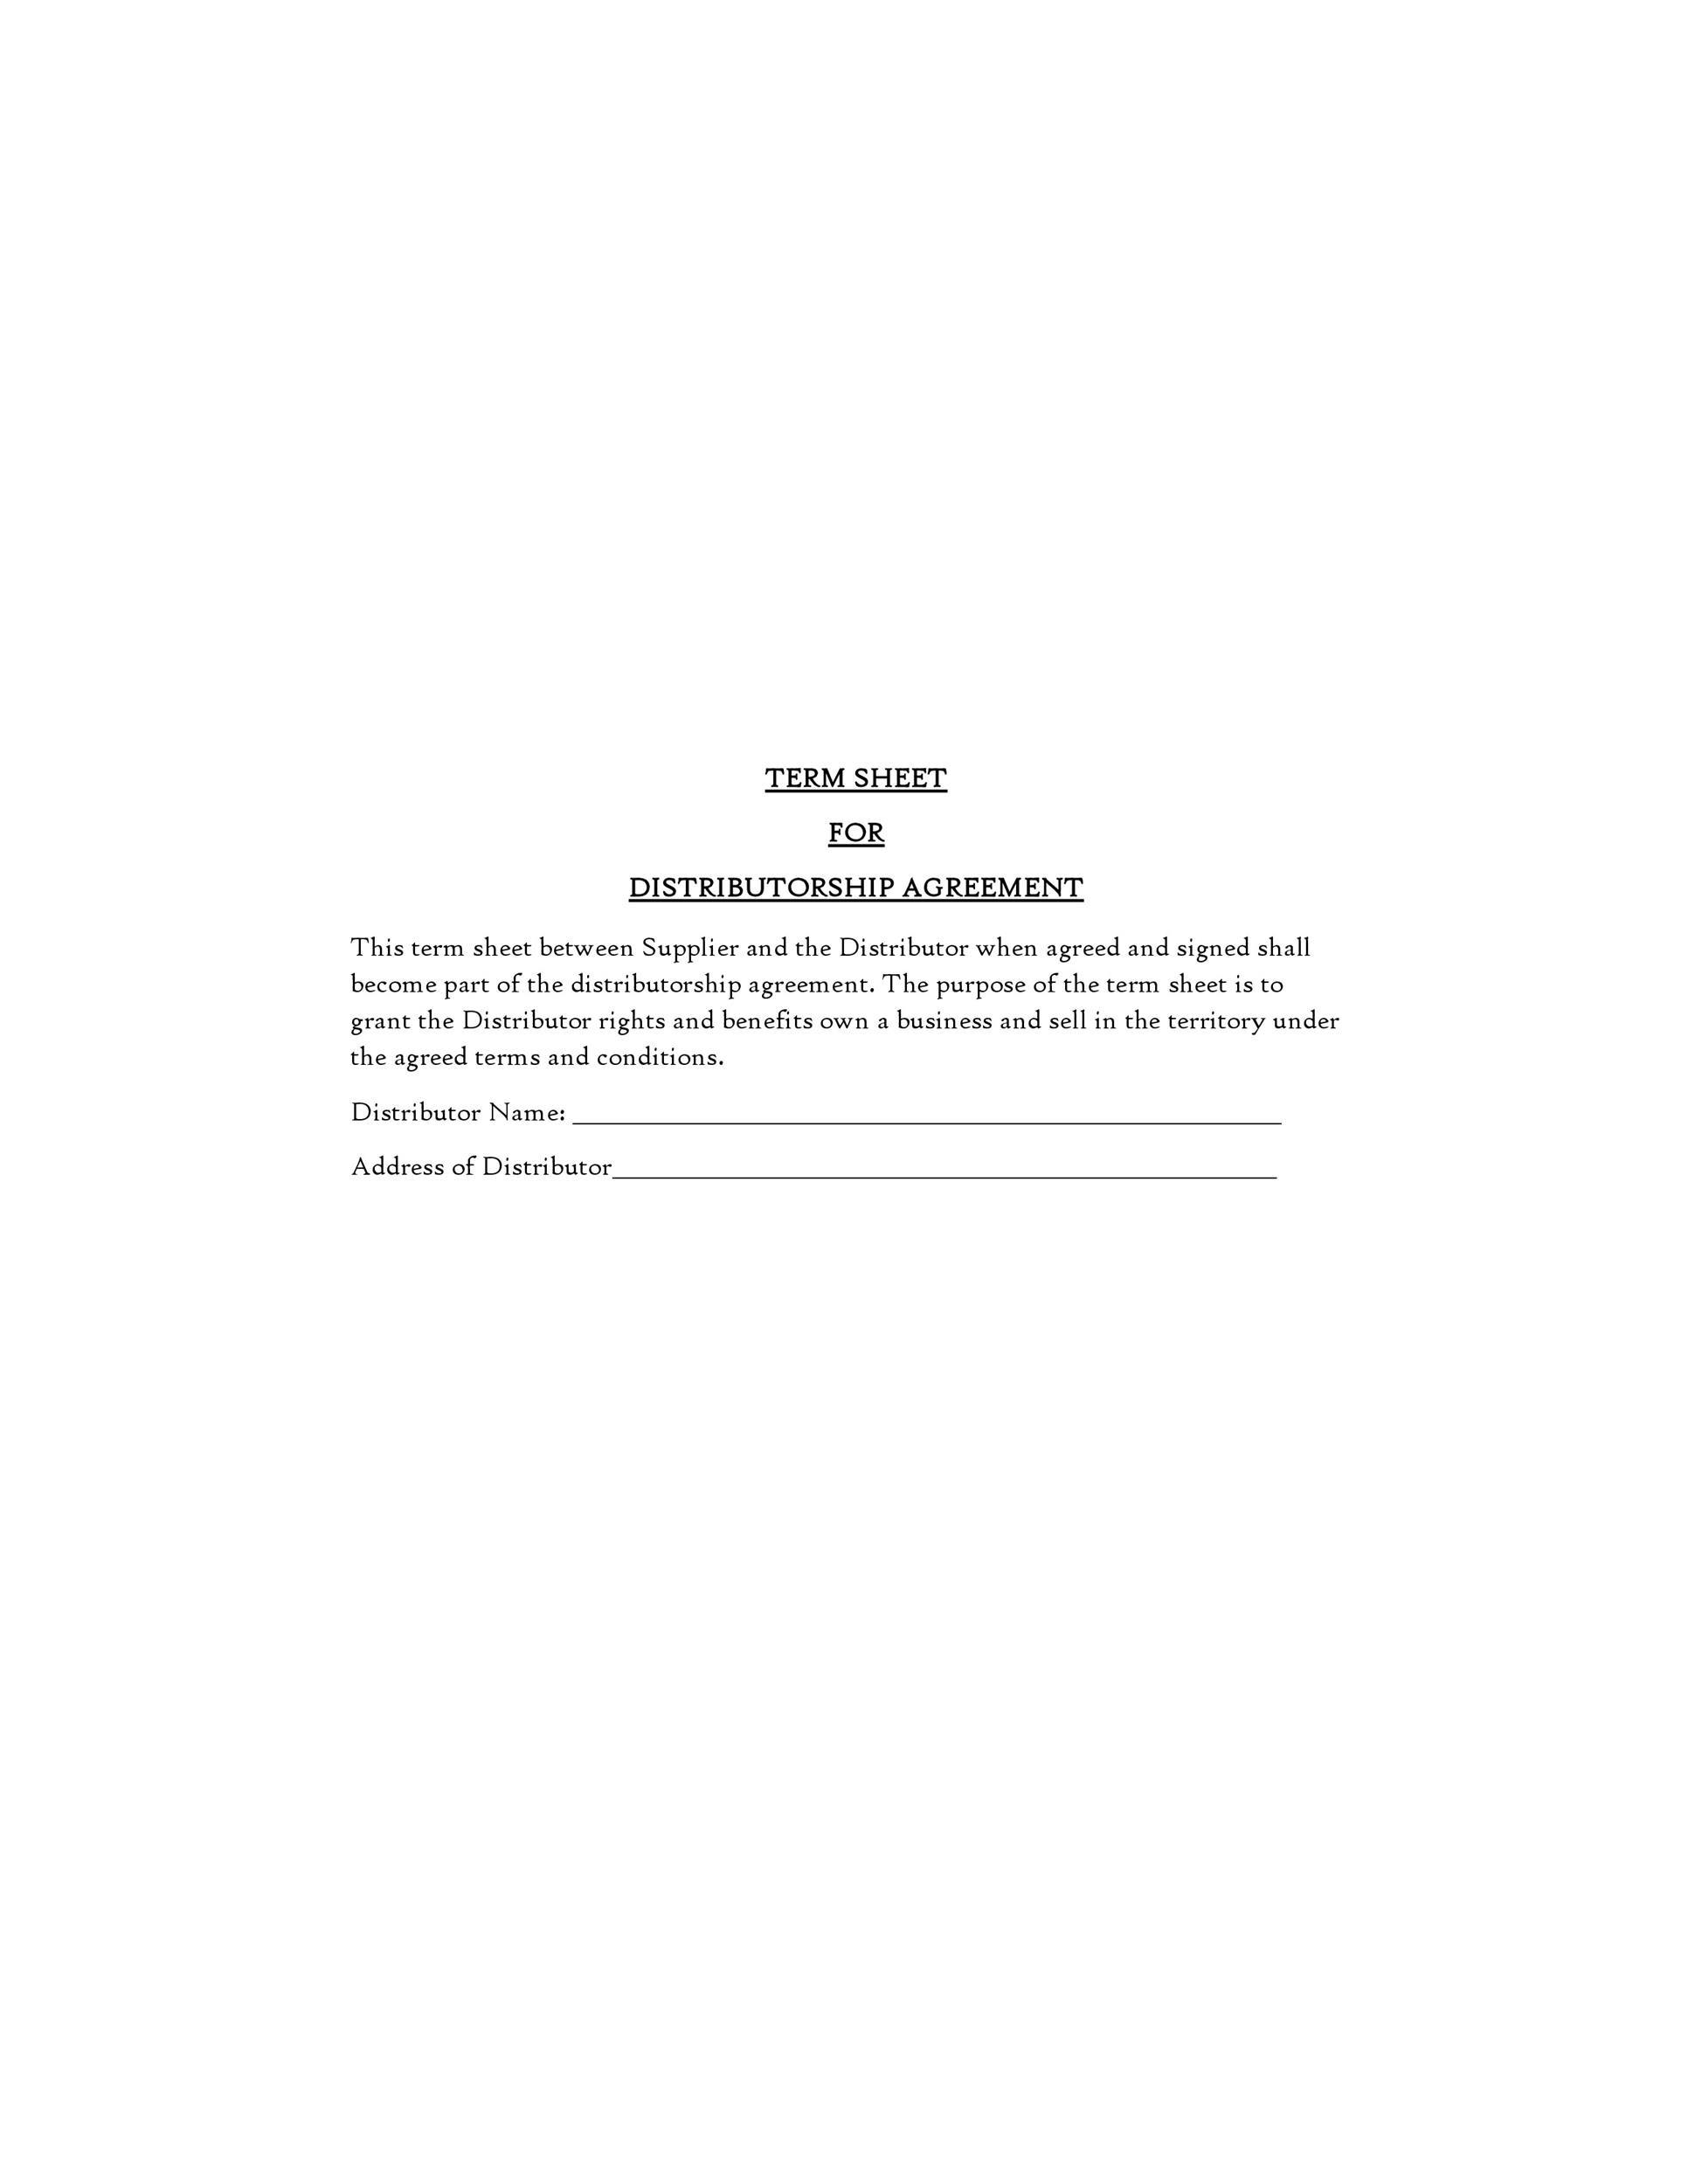 Free distribution agreement 42